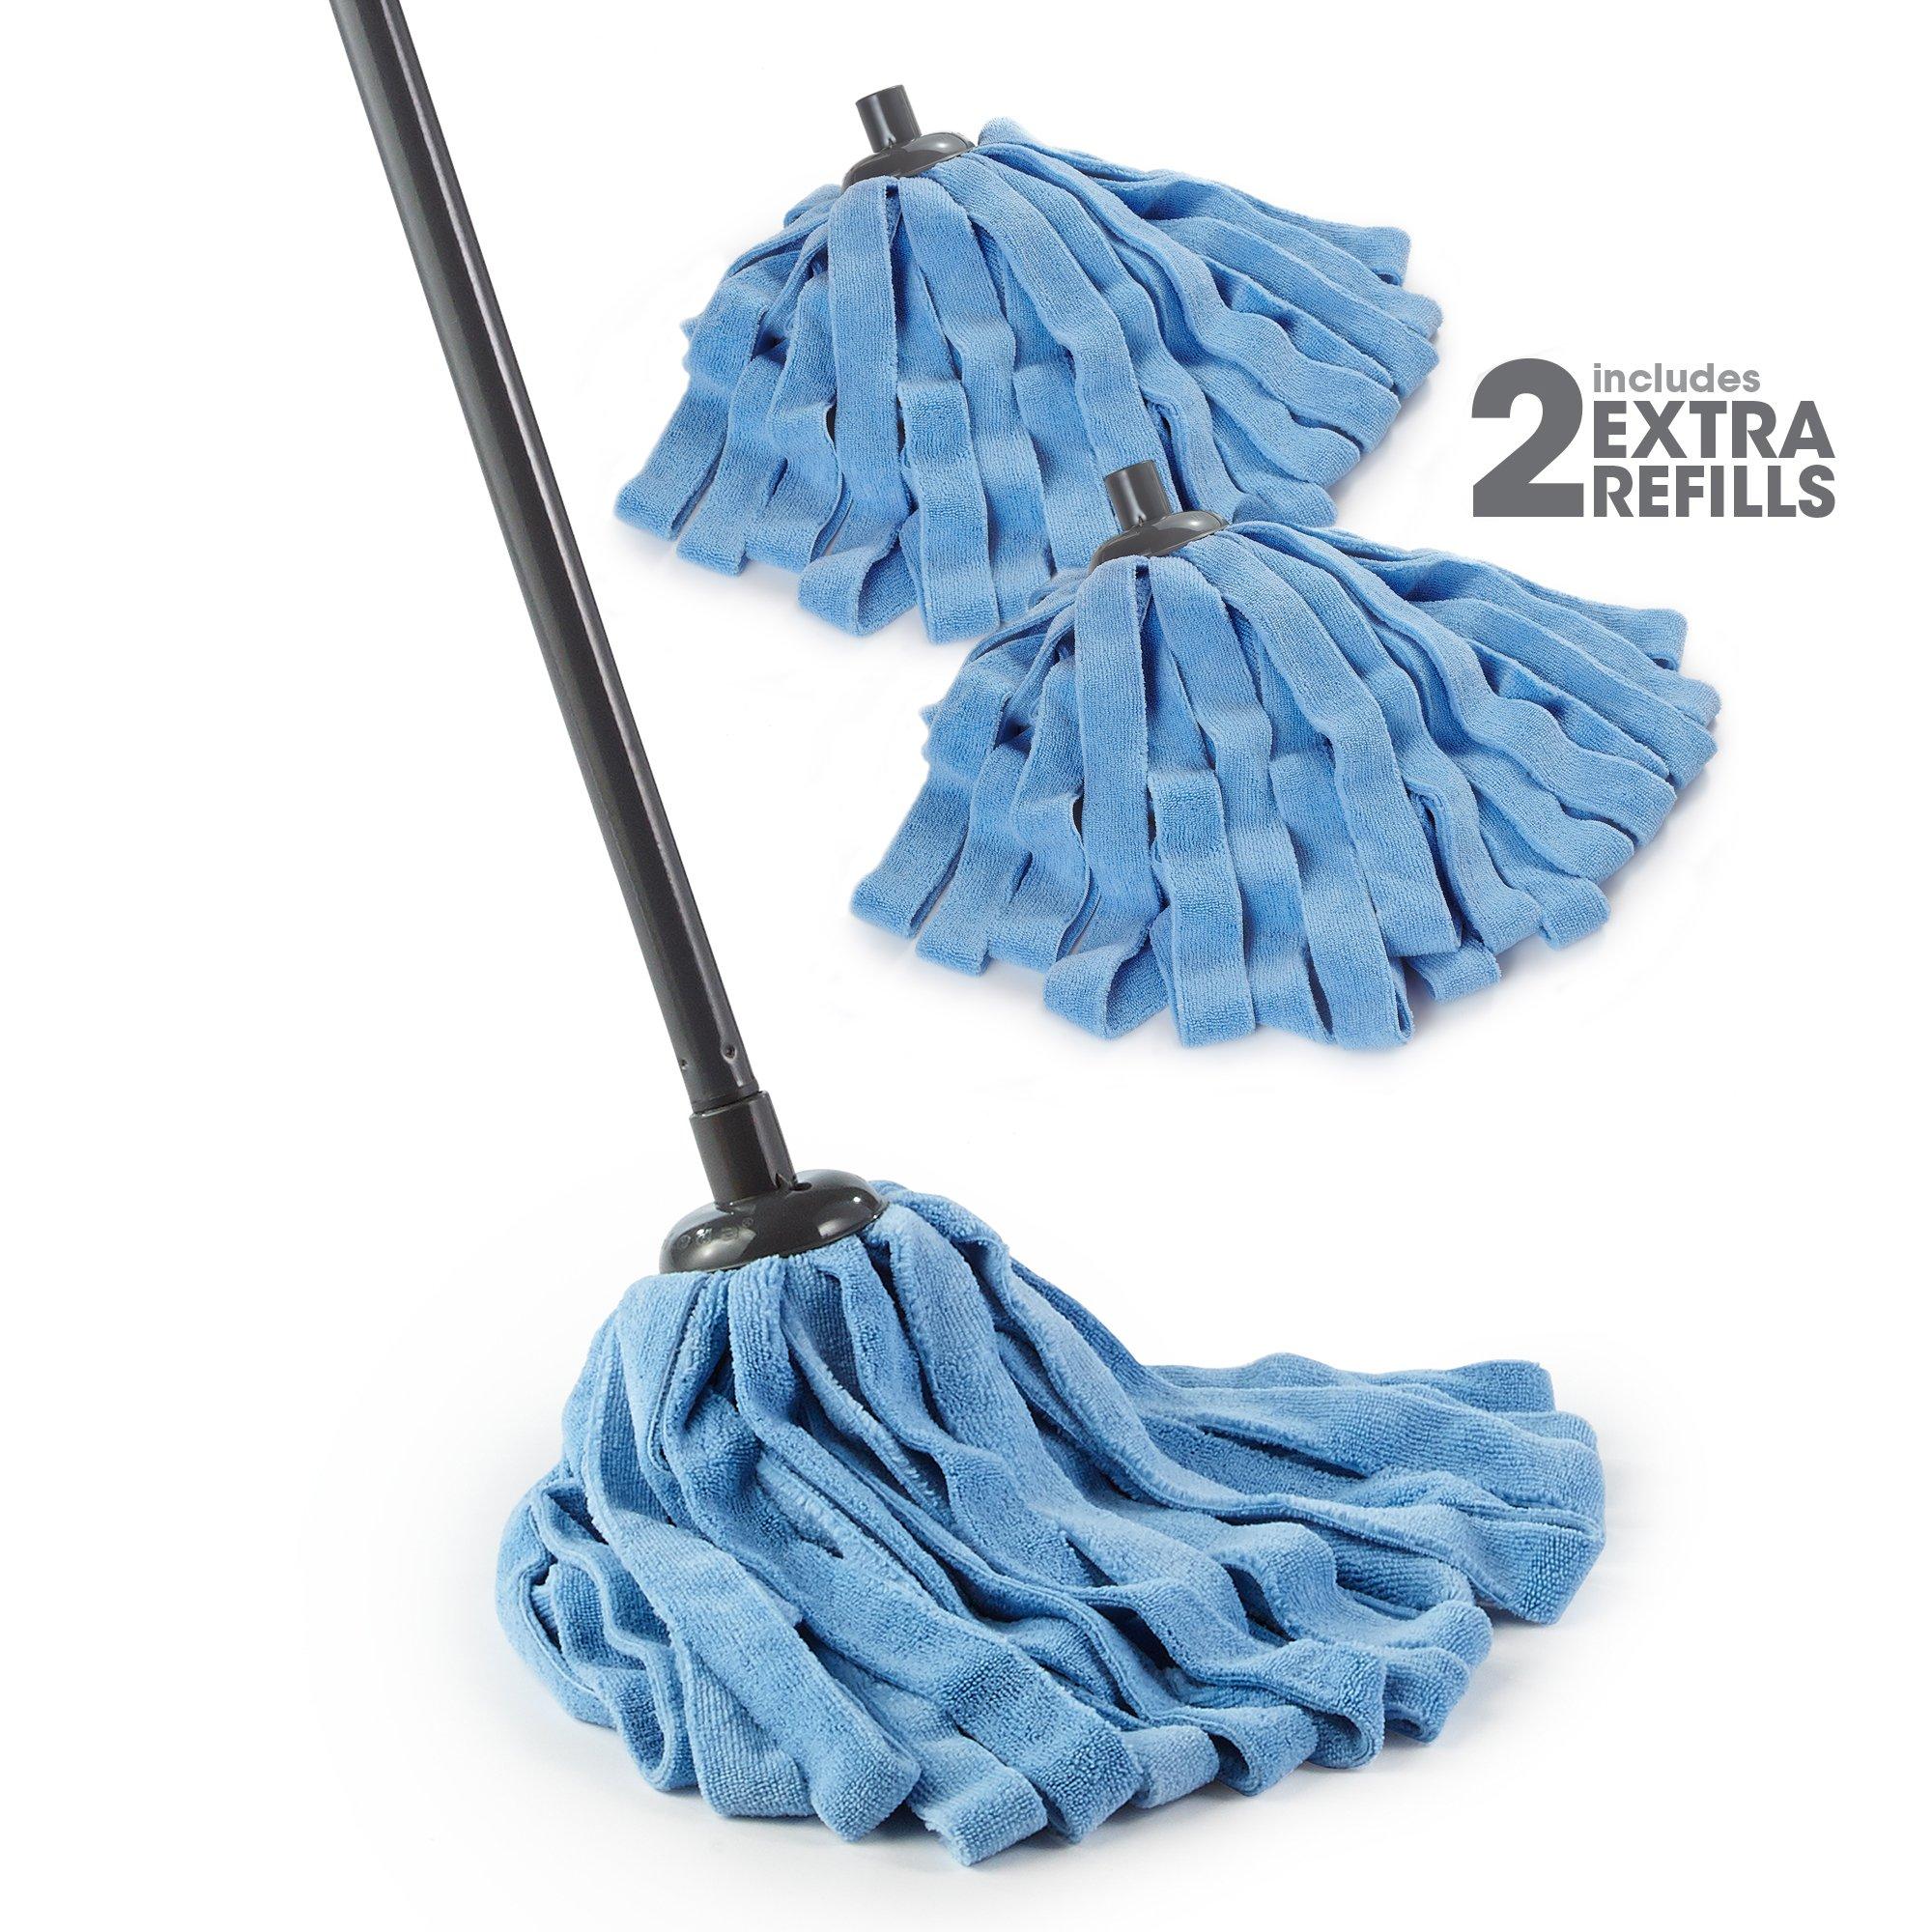 O-Cedar Microfiber Cloth Mop (Microfiber Cloth Mop with 2 Extra Refills) by O-Cedar